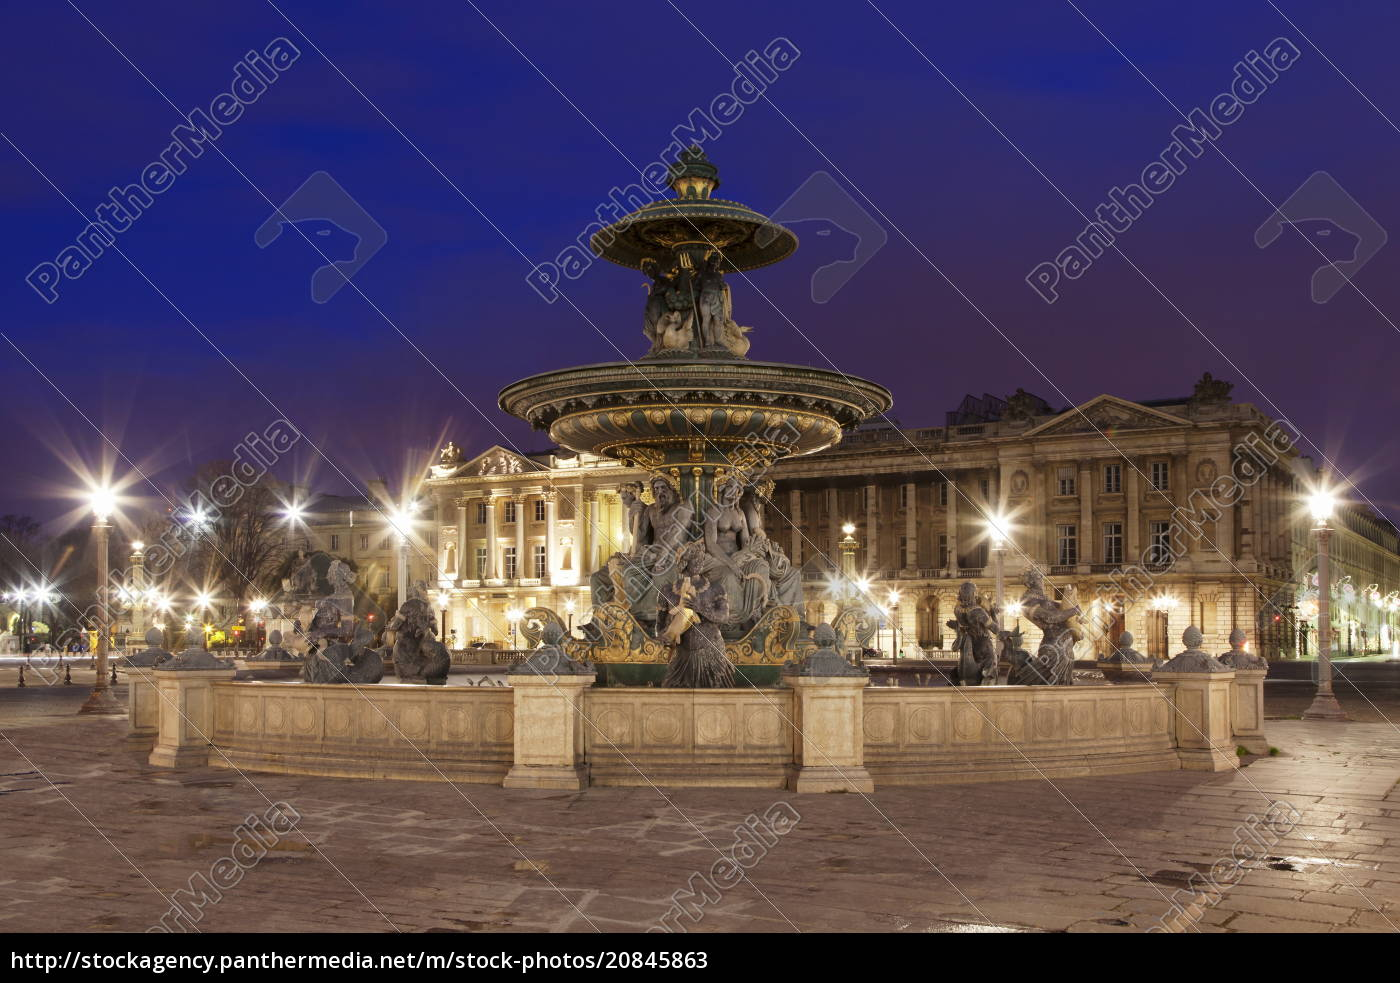 fountain, at, place, de, la, concorde, - 20845863